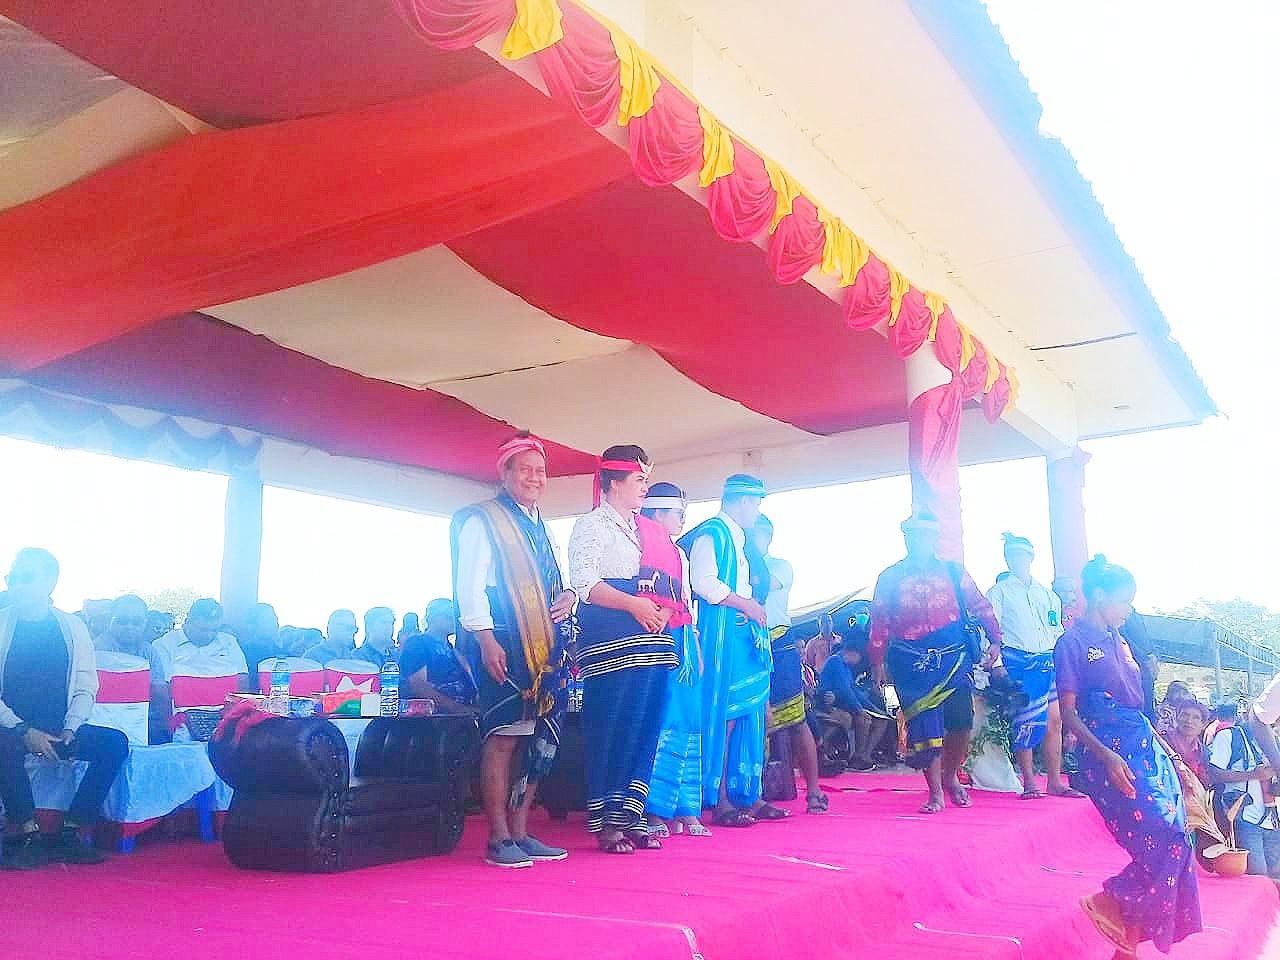 Puluhan Ribu Warga Sumba Barat Daya Hadiri Syukuran Pesta Rakyat Bupati dan Wakil Bupati